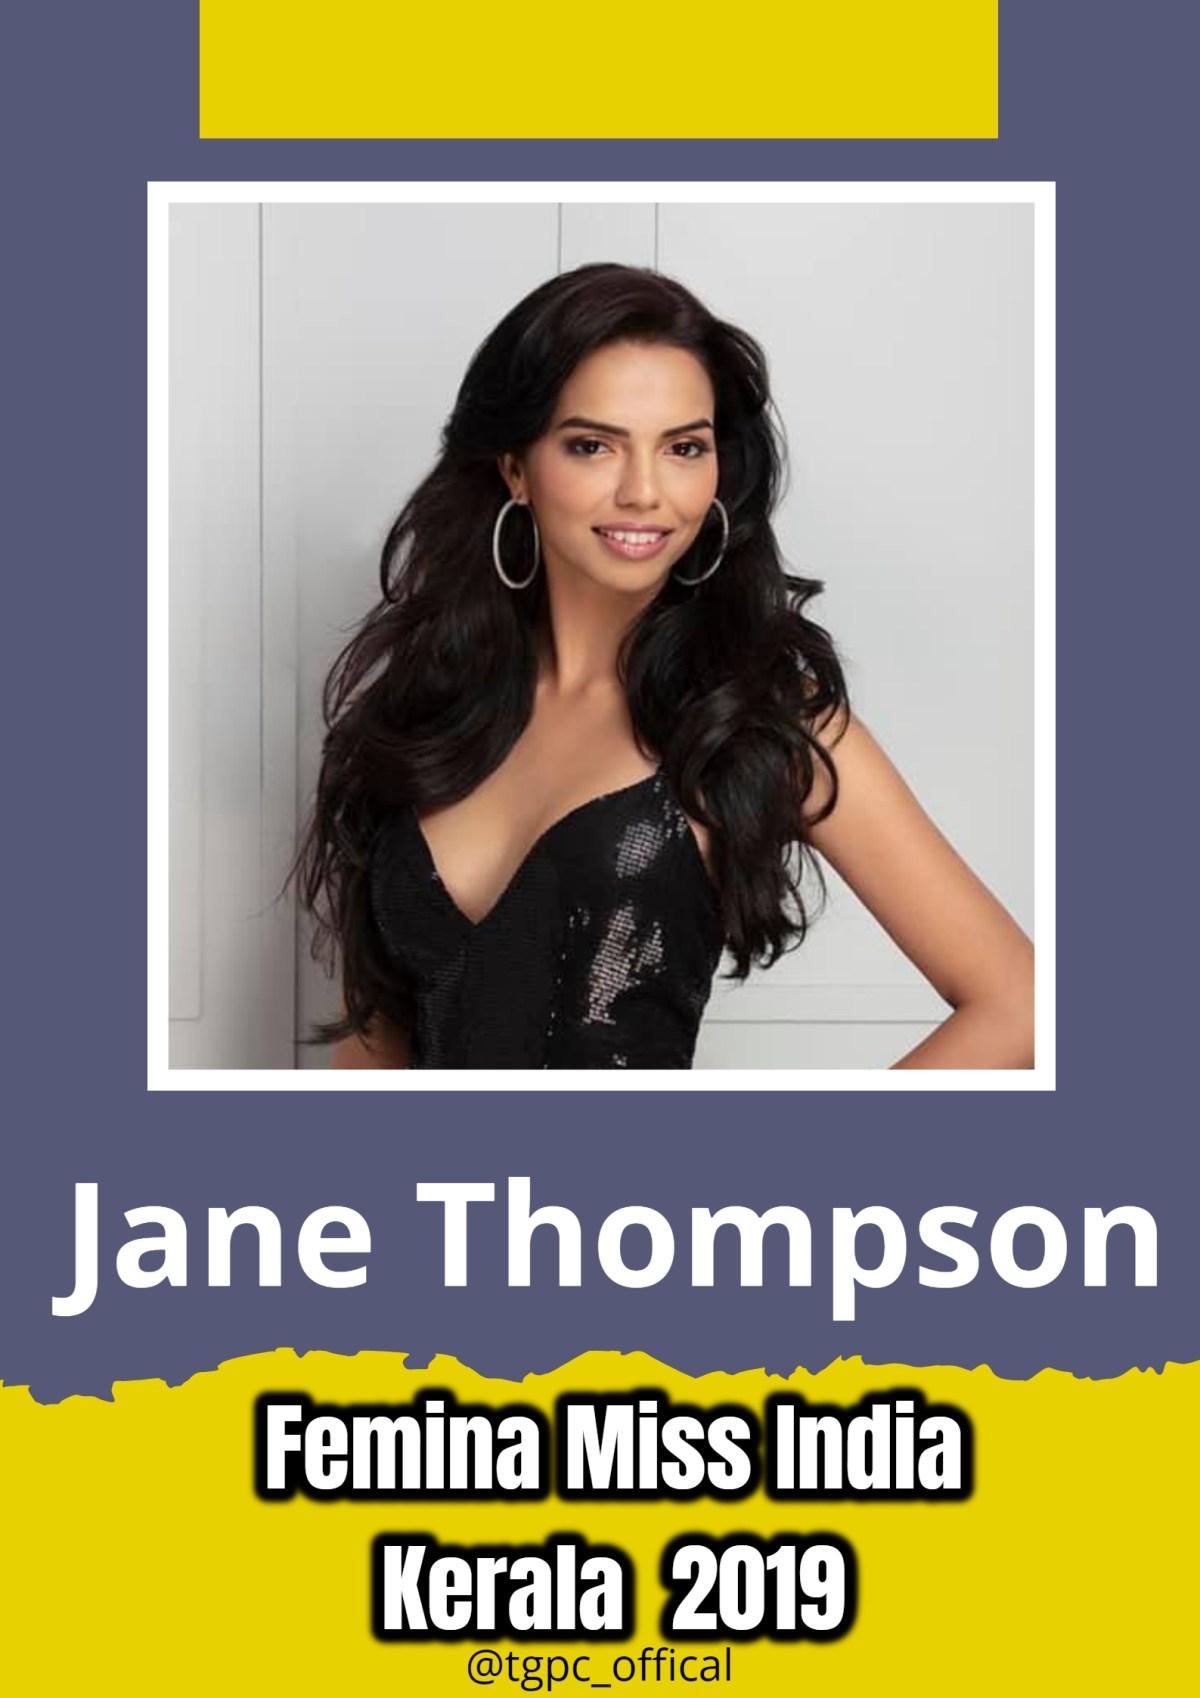 Jane Thompson will represent Kerala at Femina Miss India 2019